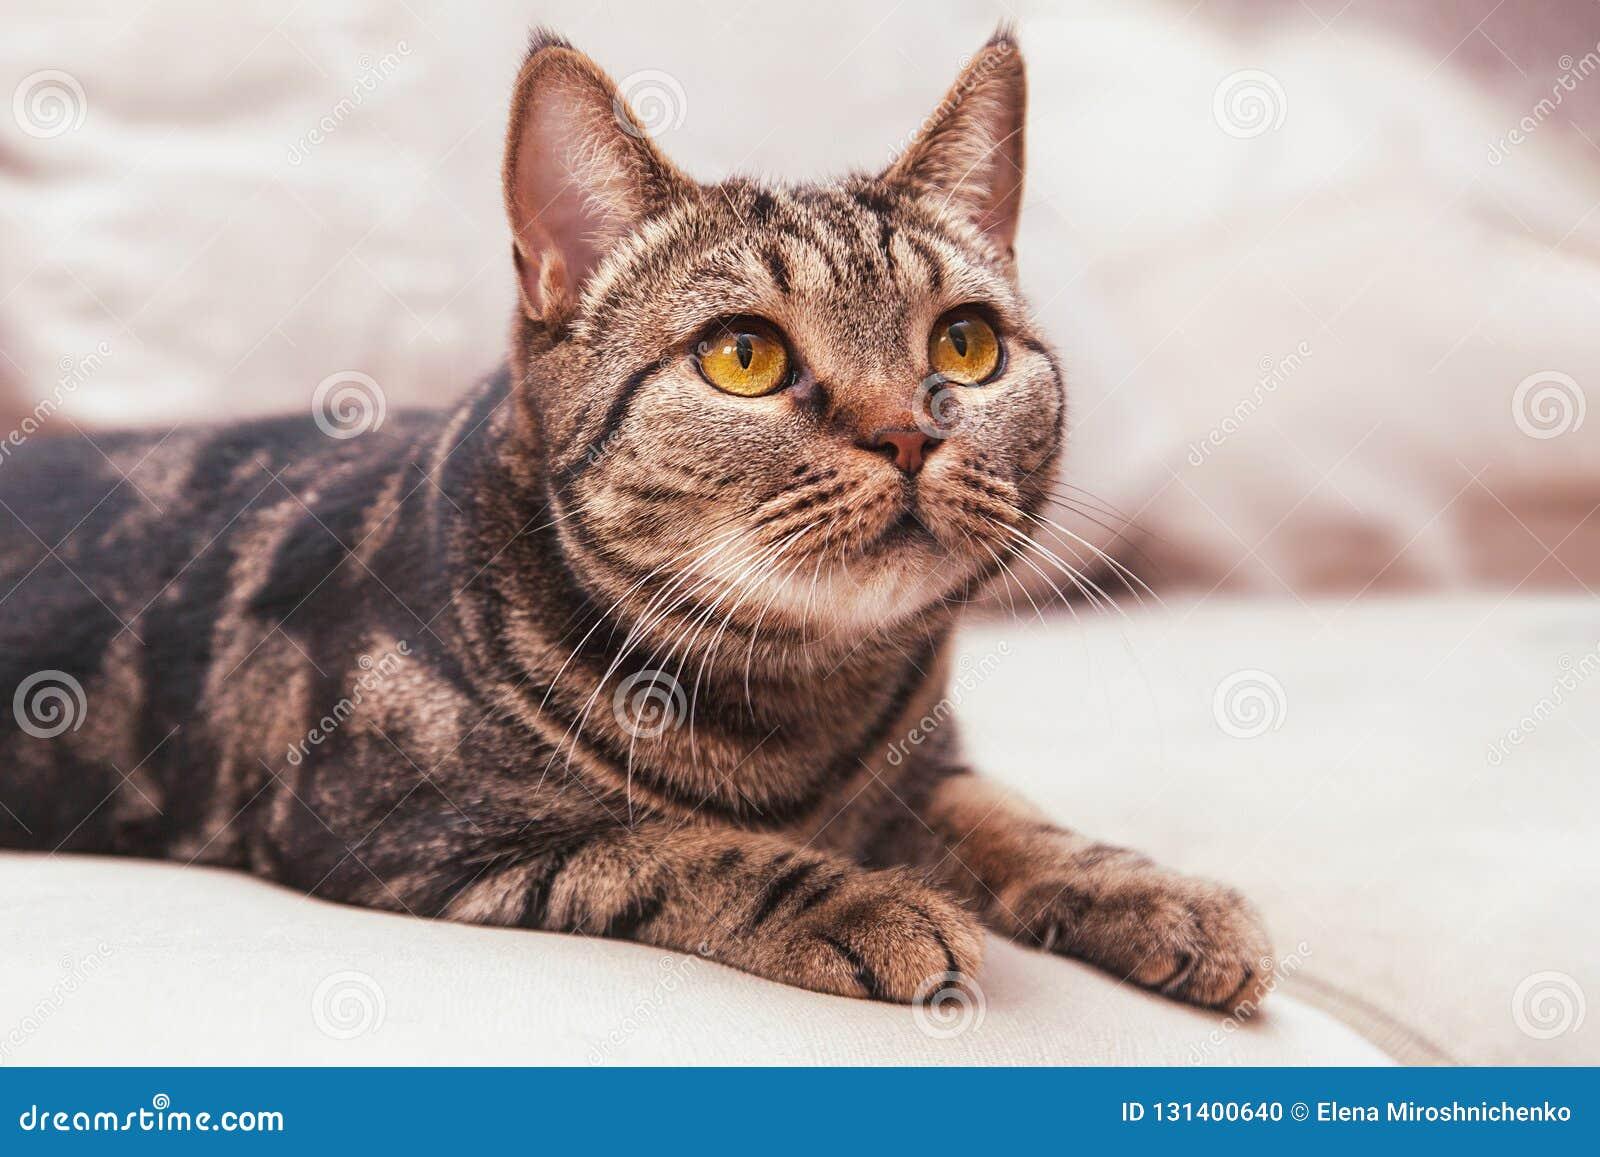 British Short hair cat breed with honey eyes